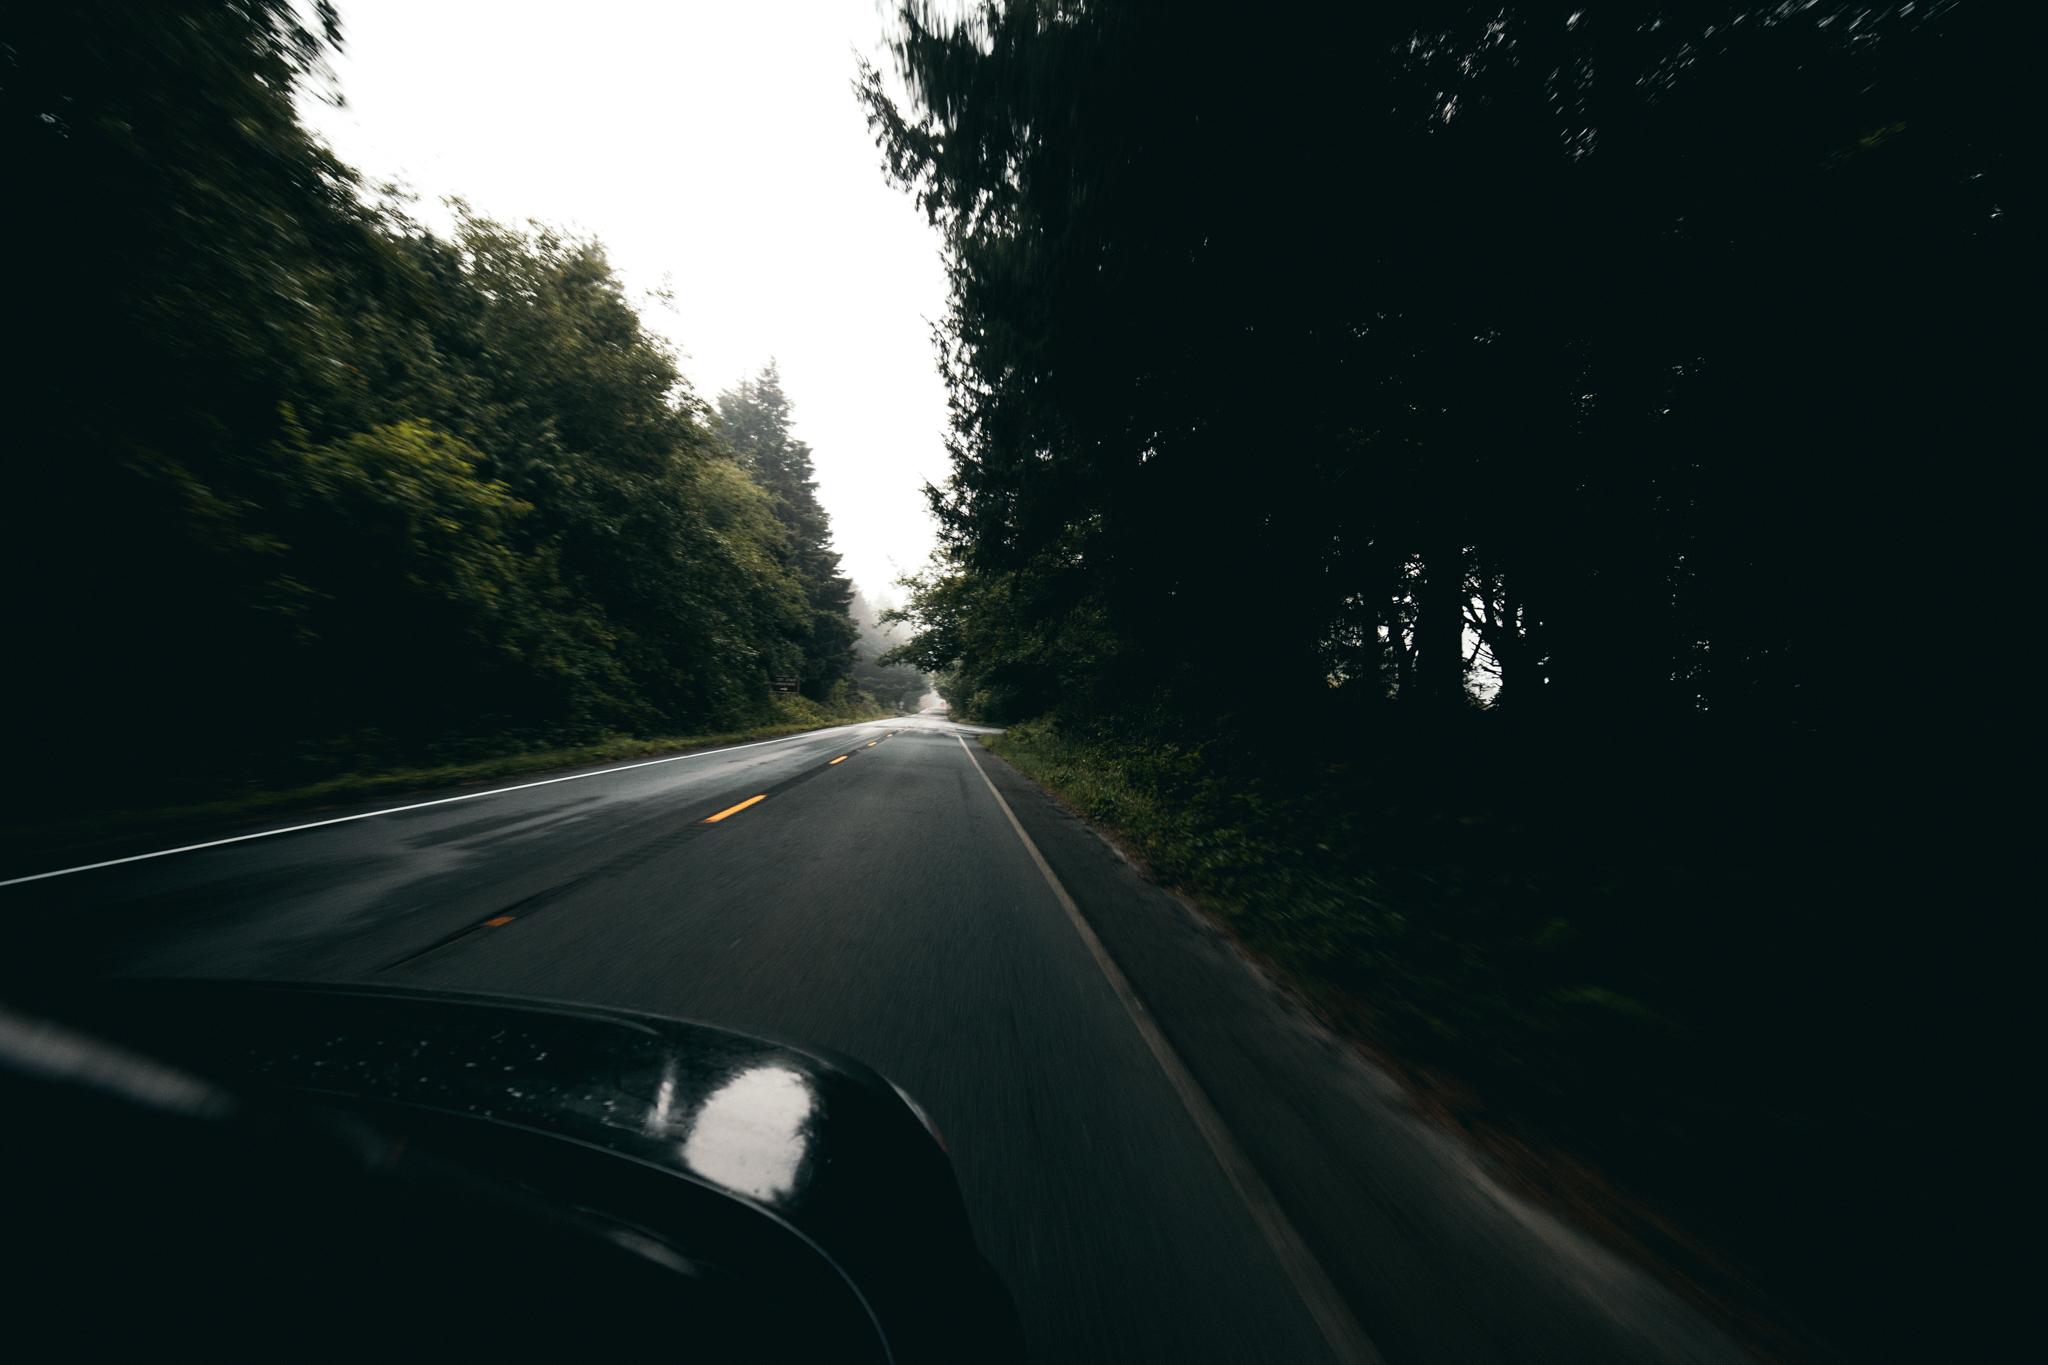 oregon-washington-pnw-coastal-hike-travel-adventure-lifestyle-kal visuals-wilderness-explore